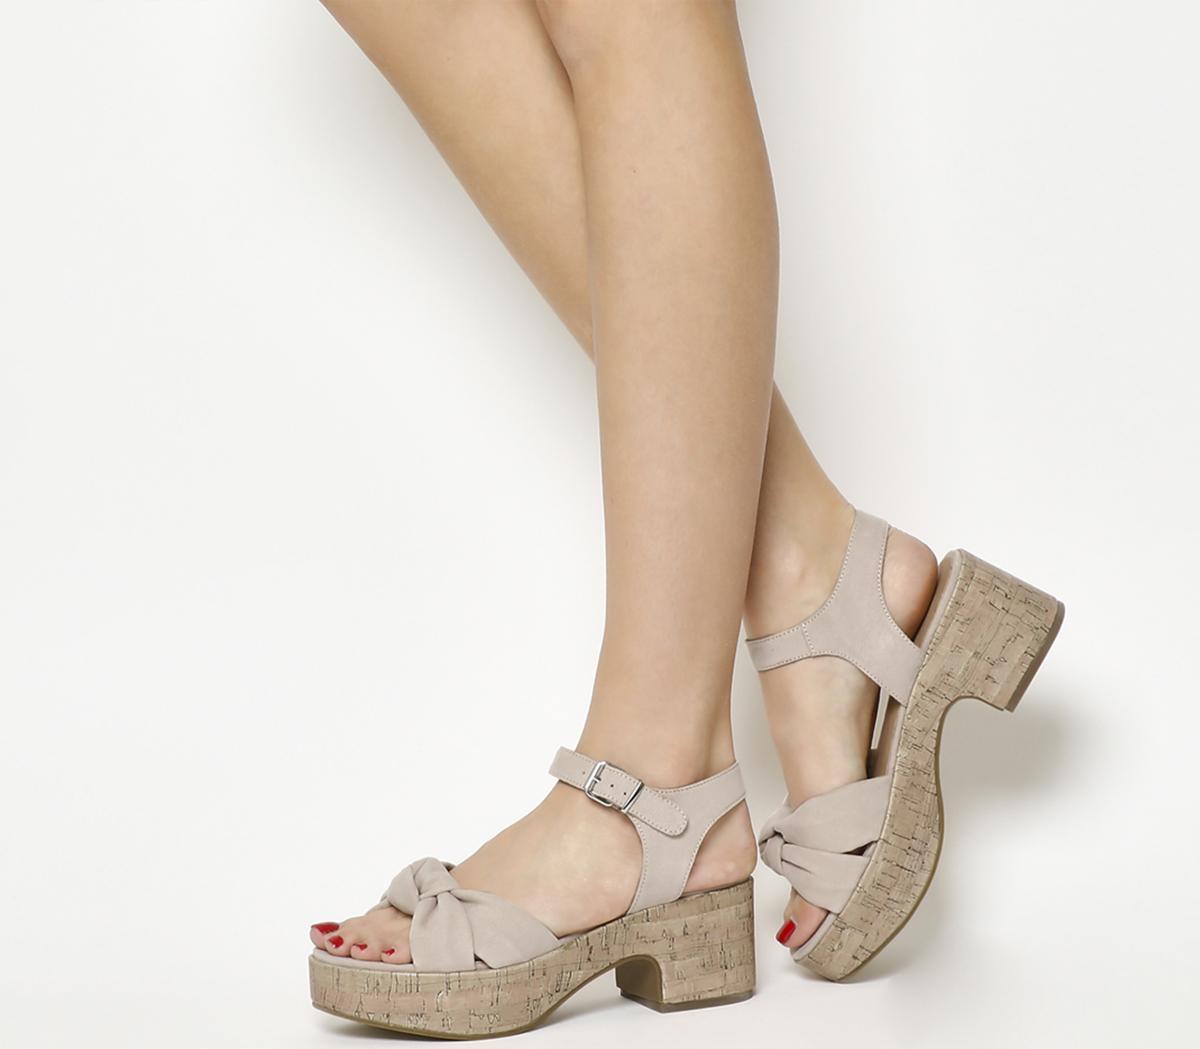 Magnolia Flatform Sandals